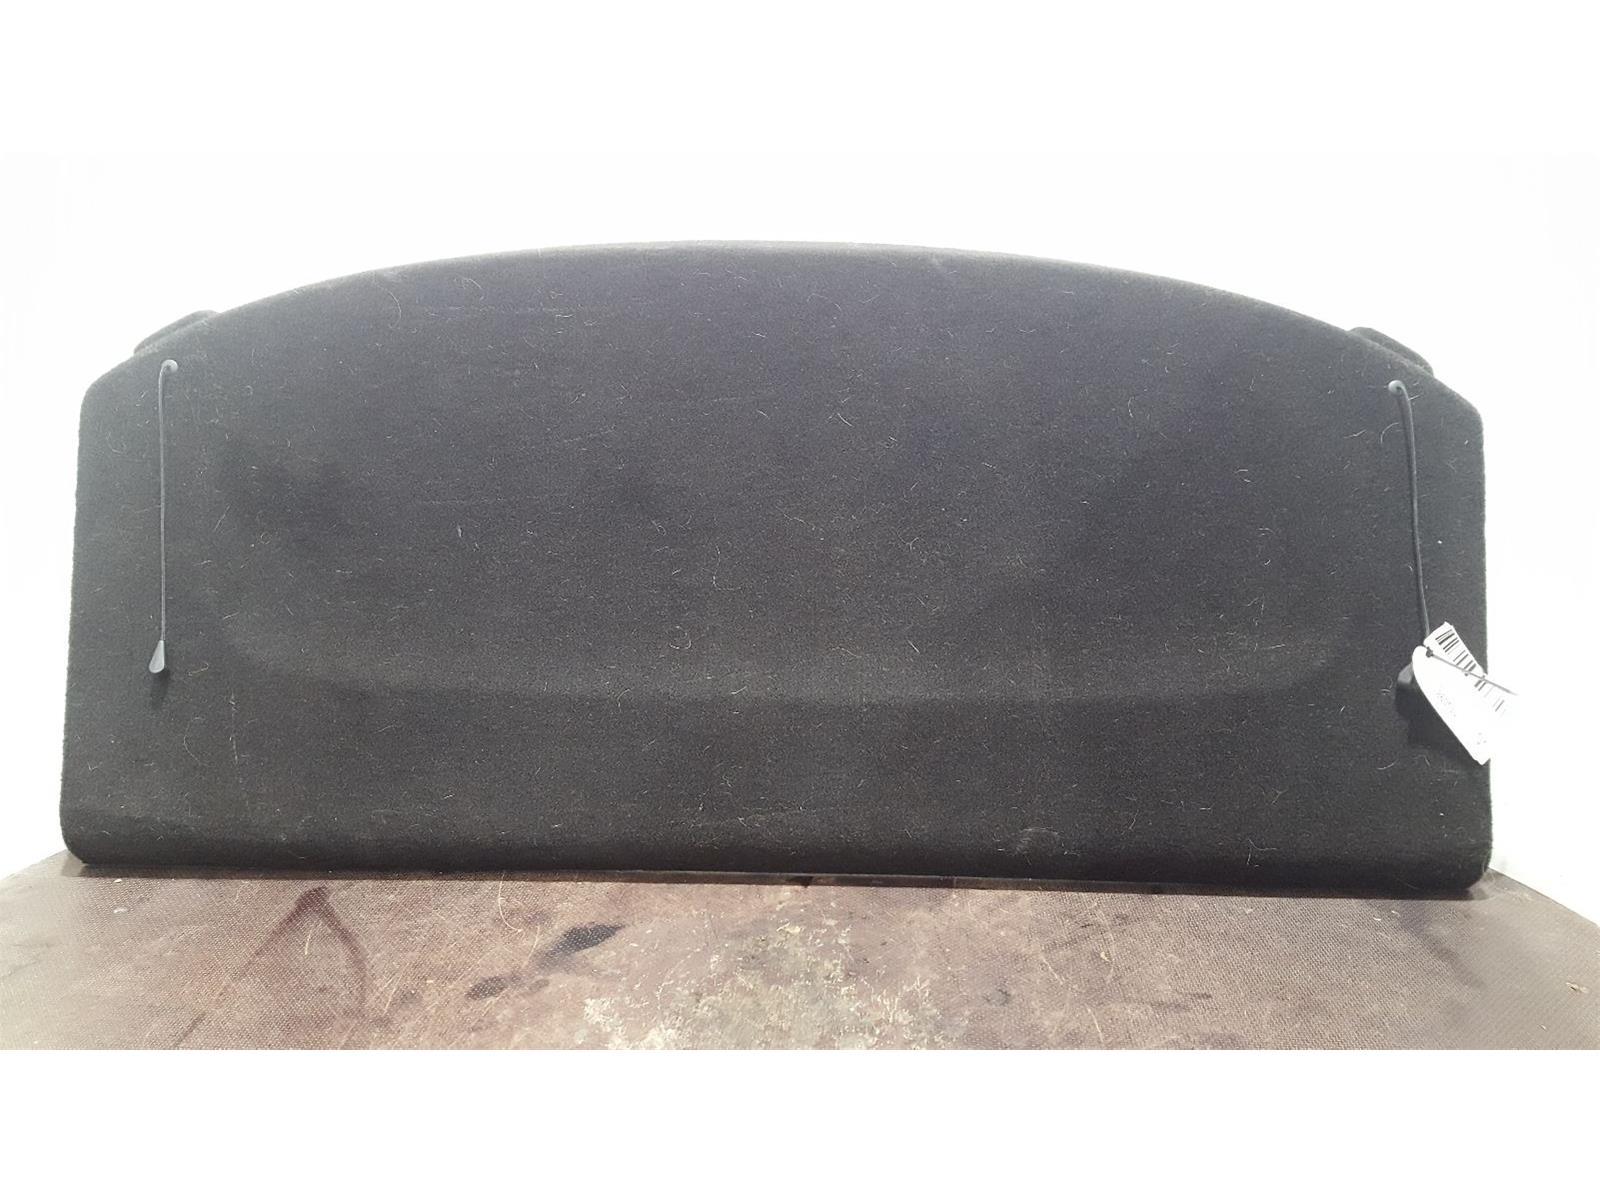 SEAT Leon 2005 To 2009 5 Door Hatchback Load Cover Parcel Shelf